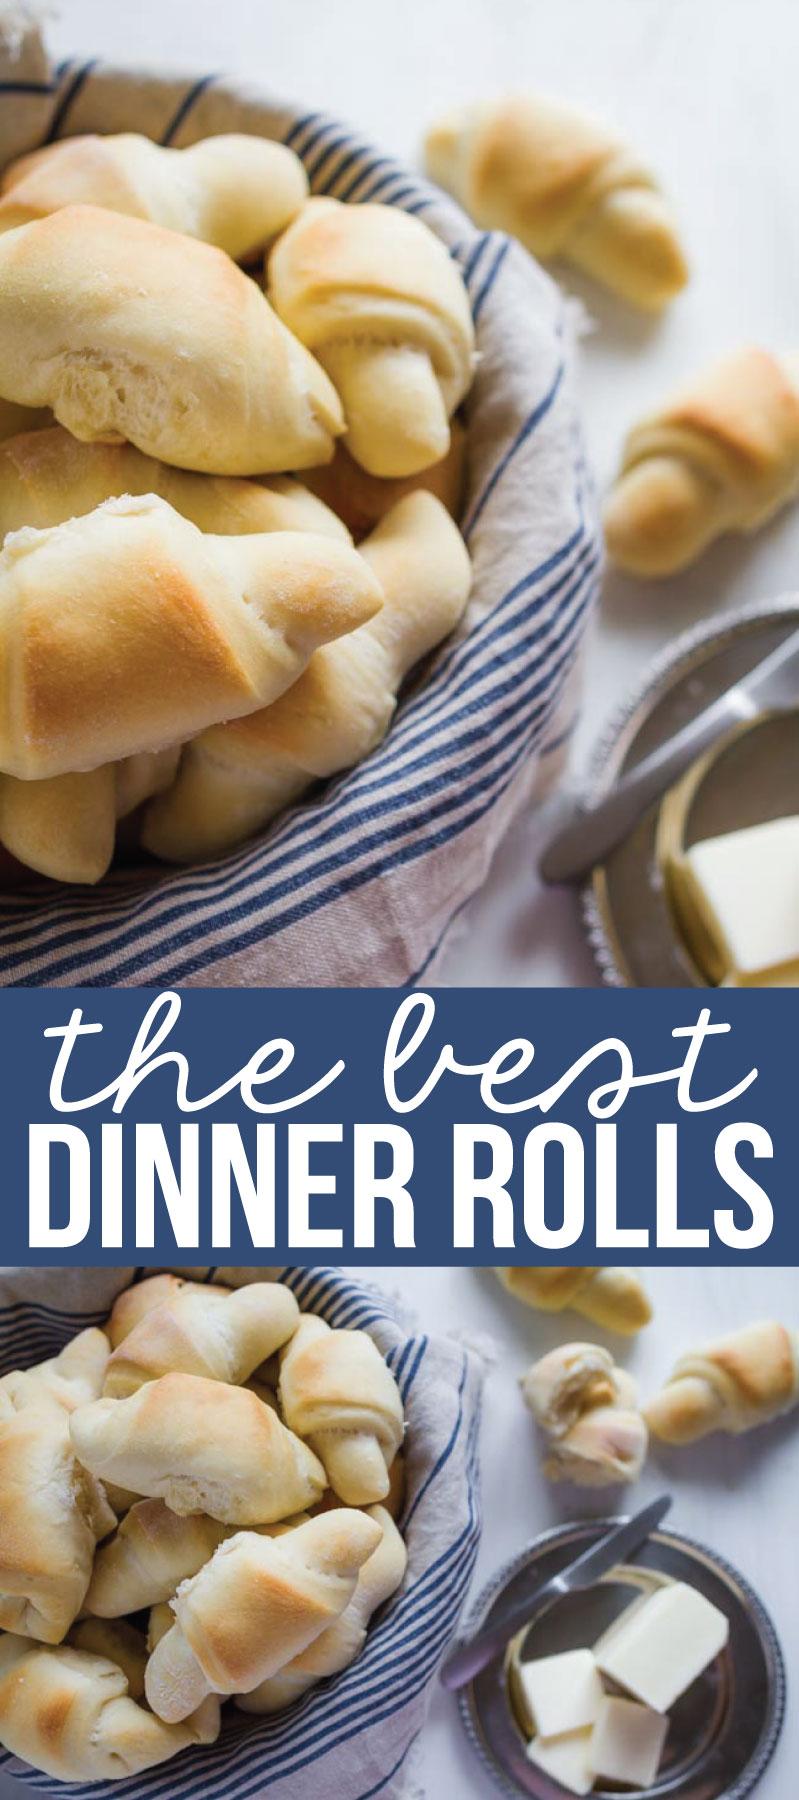 Food: The best dinner rolls - tasty, buttery, soft dinner rolls that will melt in your mouth. via www.thirtyhandmadedays.com